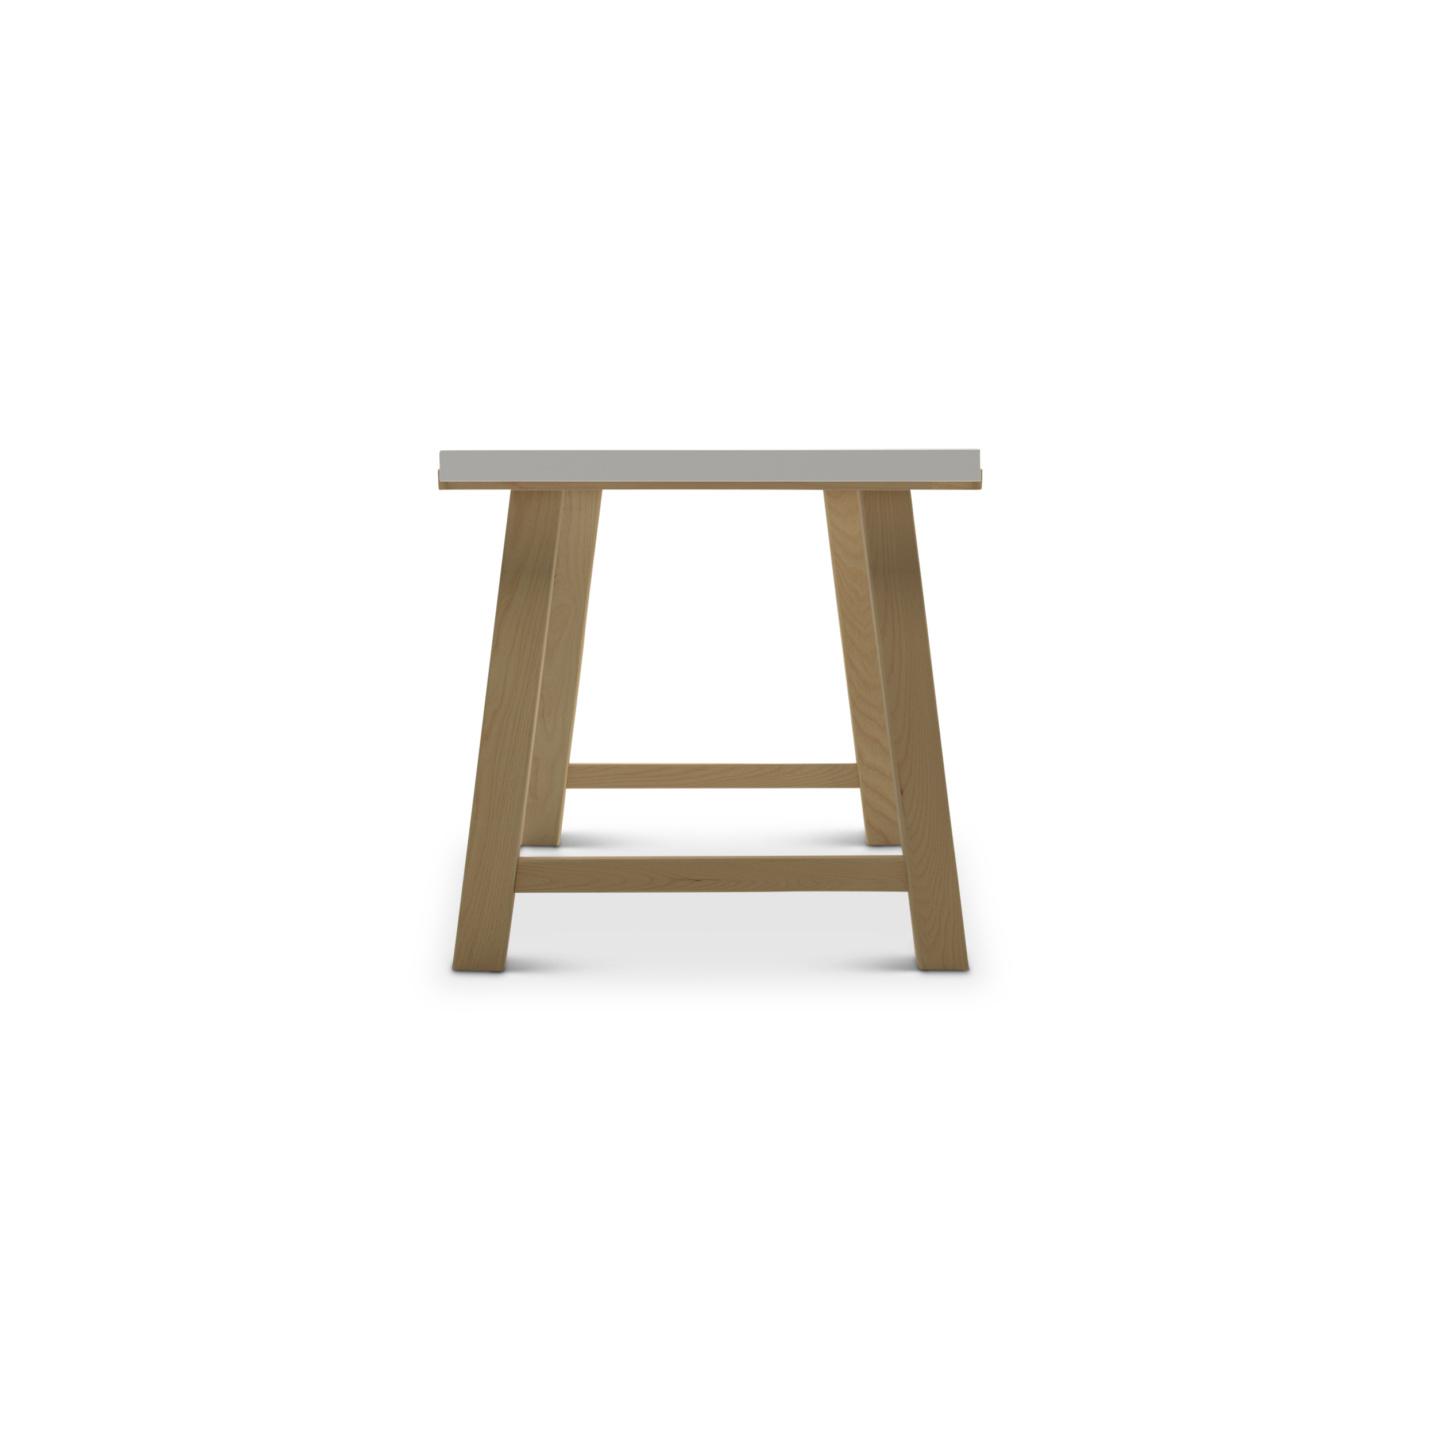 Danish desk with Ash wooden legs